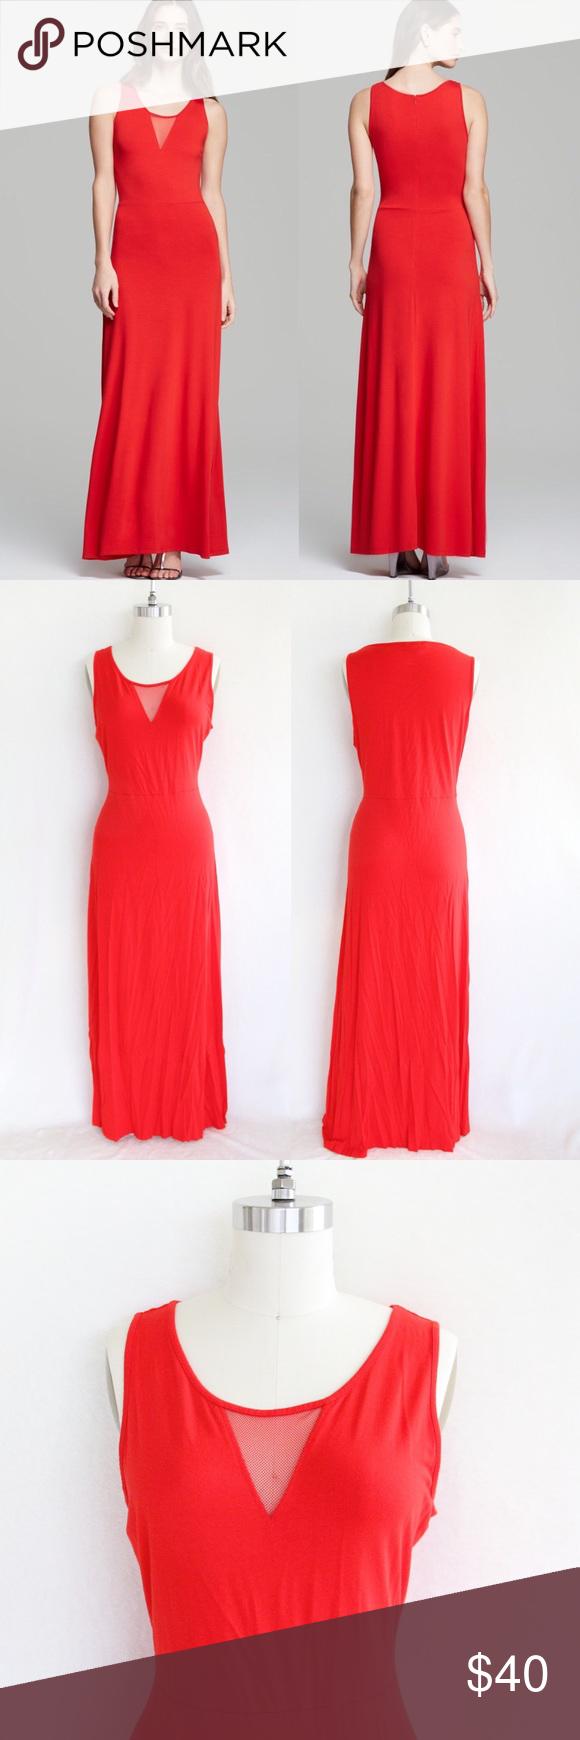 Vince Camuto Red Orange Sleeveless Maxi Dress Sleeveless Maxi Dress Dresses Maxi Dress [ 1740 x 580 Pixel ]